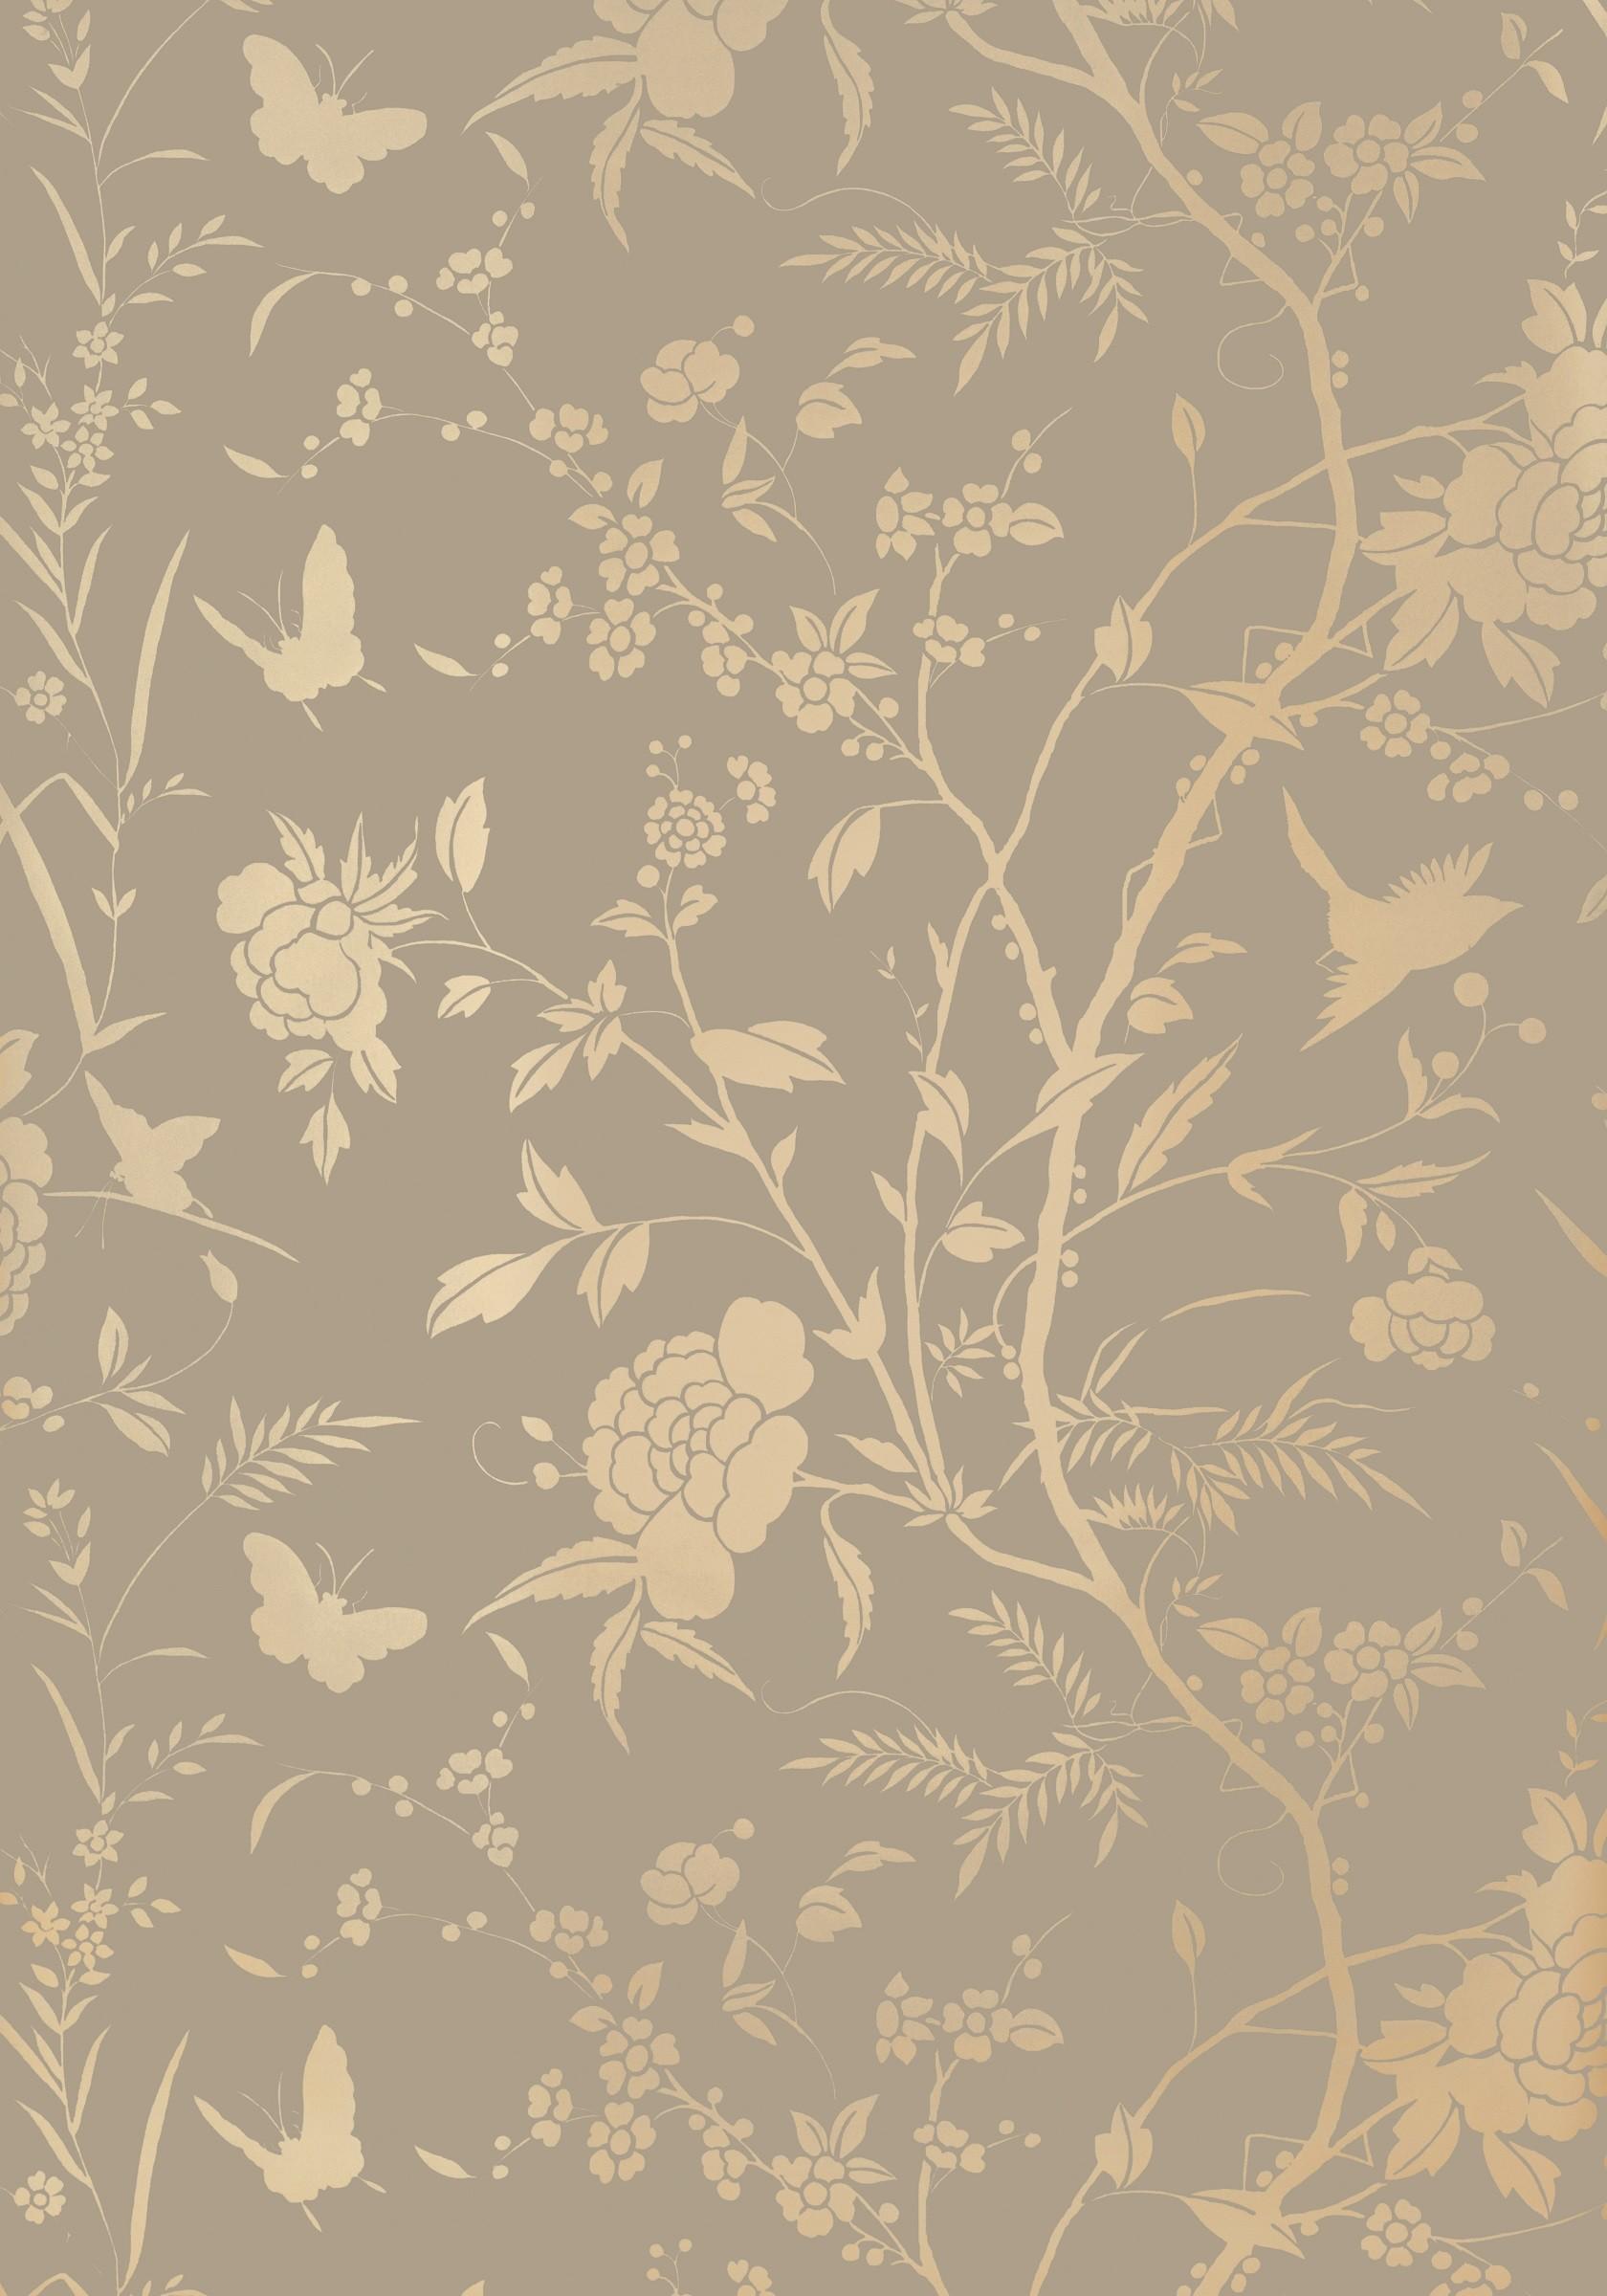 Gold Foil Wallpaper Uk